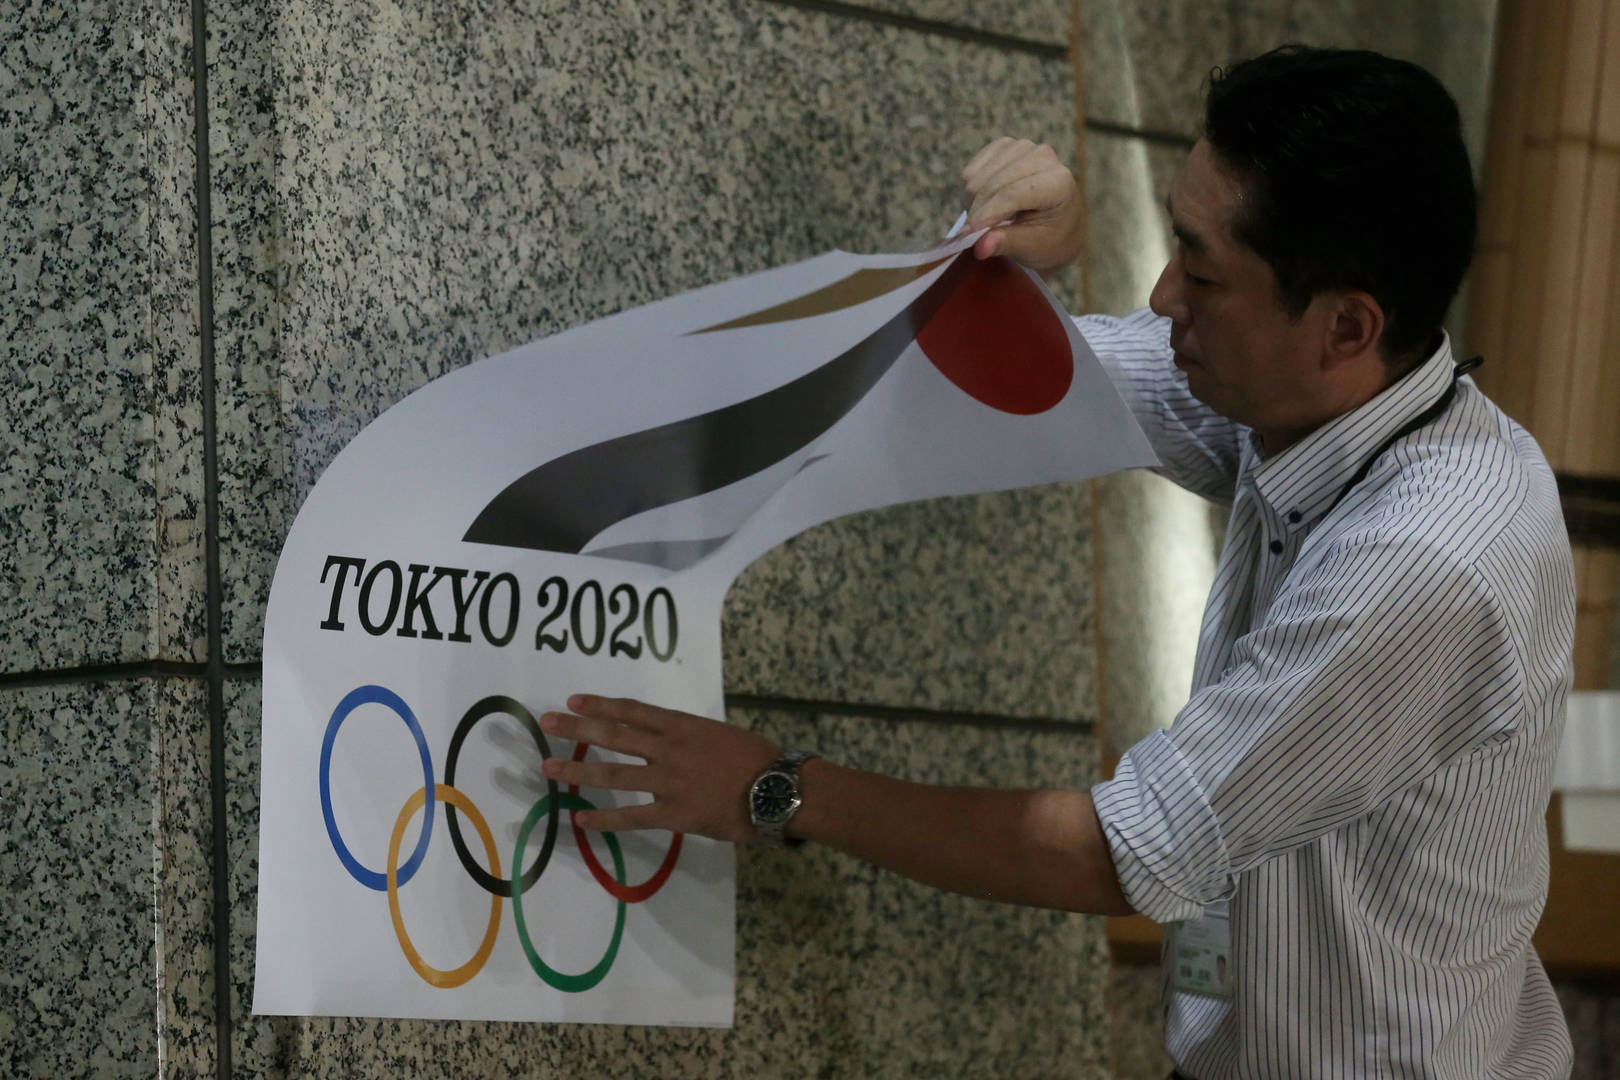 Coronavirus: 2020 Tokyo Olympics Officially Postponed